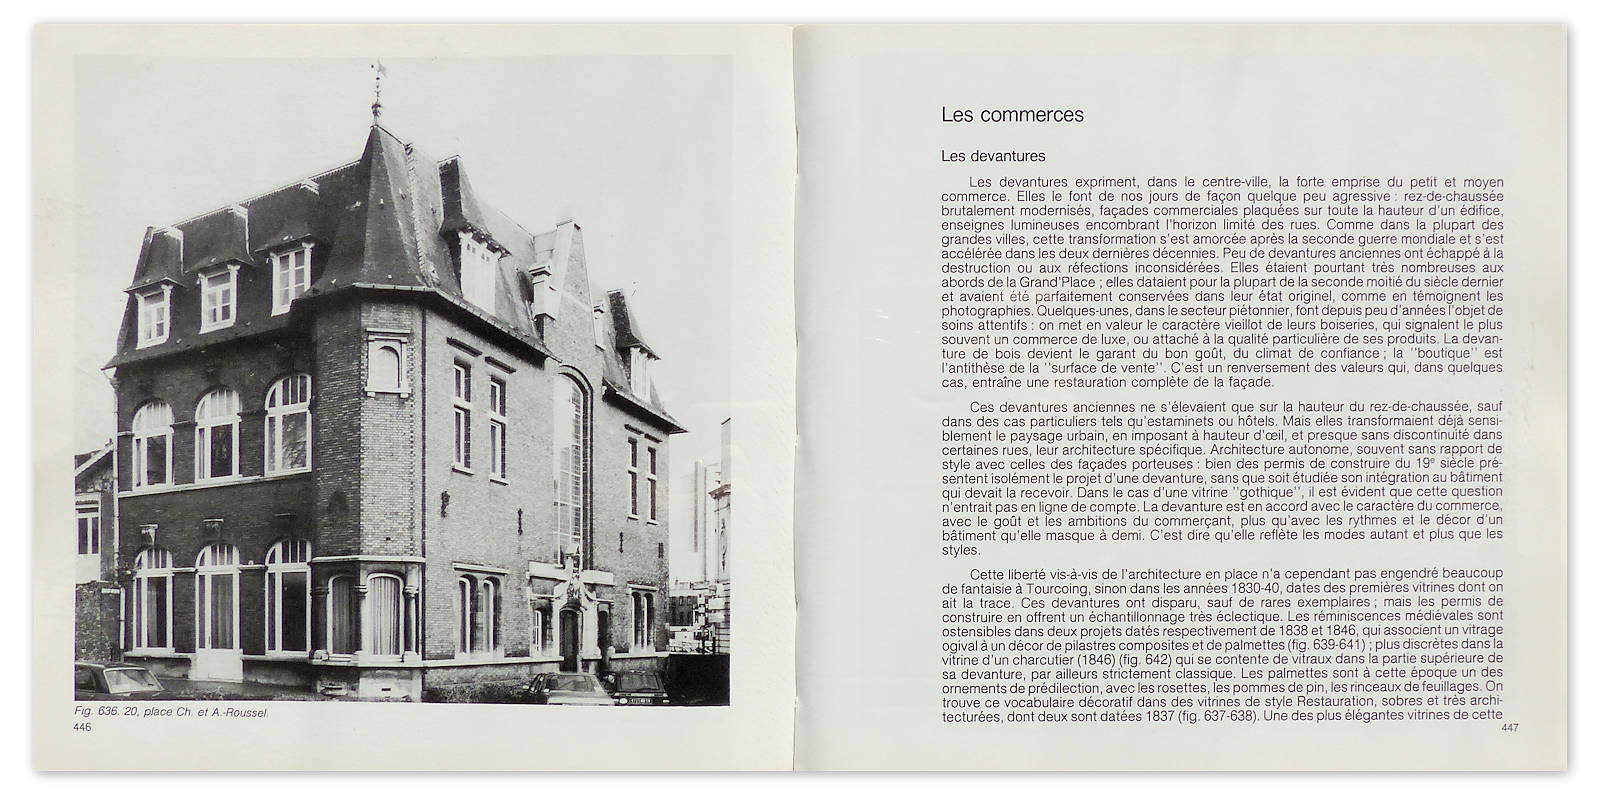 Livre - Tourcoing 1771-1984, pages 446 et 447